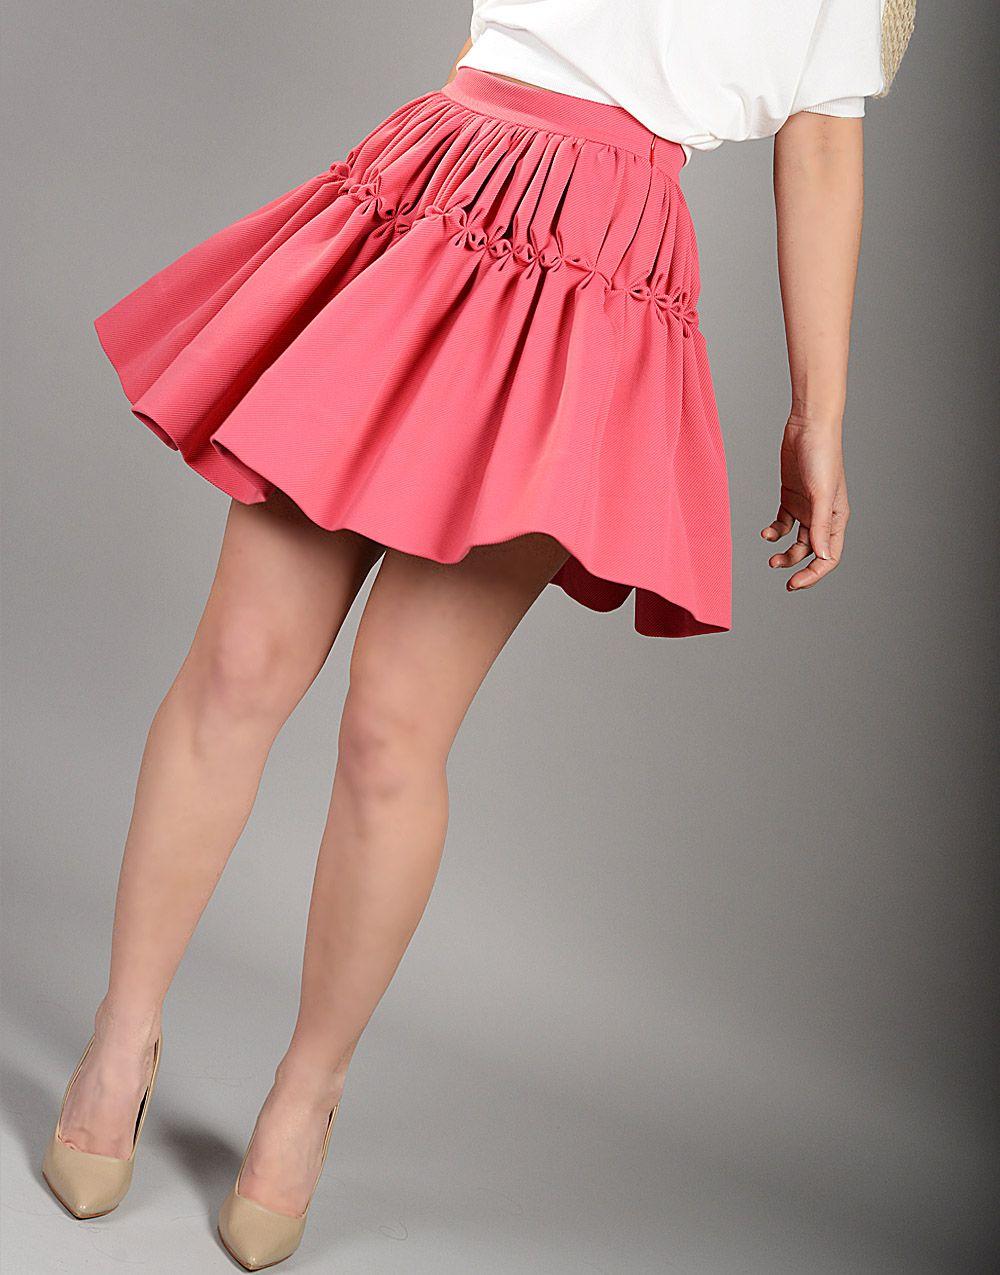 Mini skirts loose Pleated Skirt Retro Skirt Pink Skirt A Line Skirt Etsy In 2021 Retro Skirt Pink Skirt Plus Size Mini Skirts